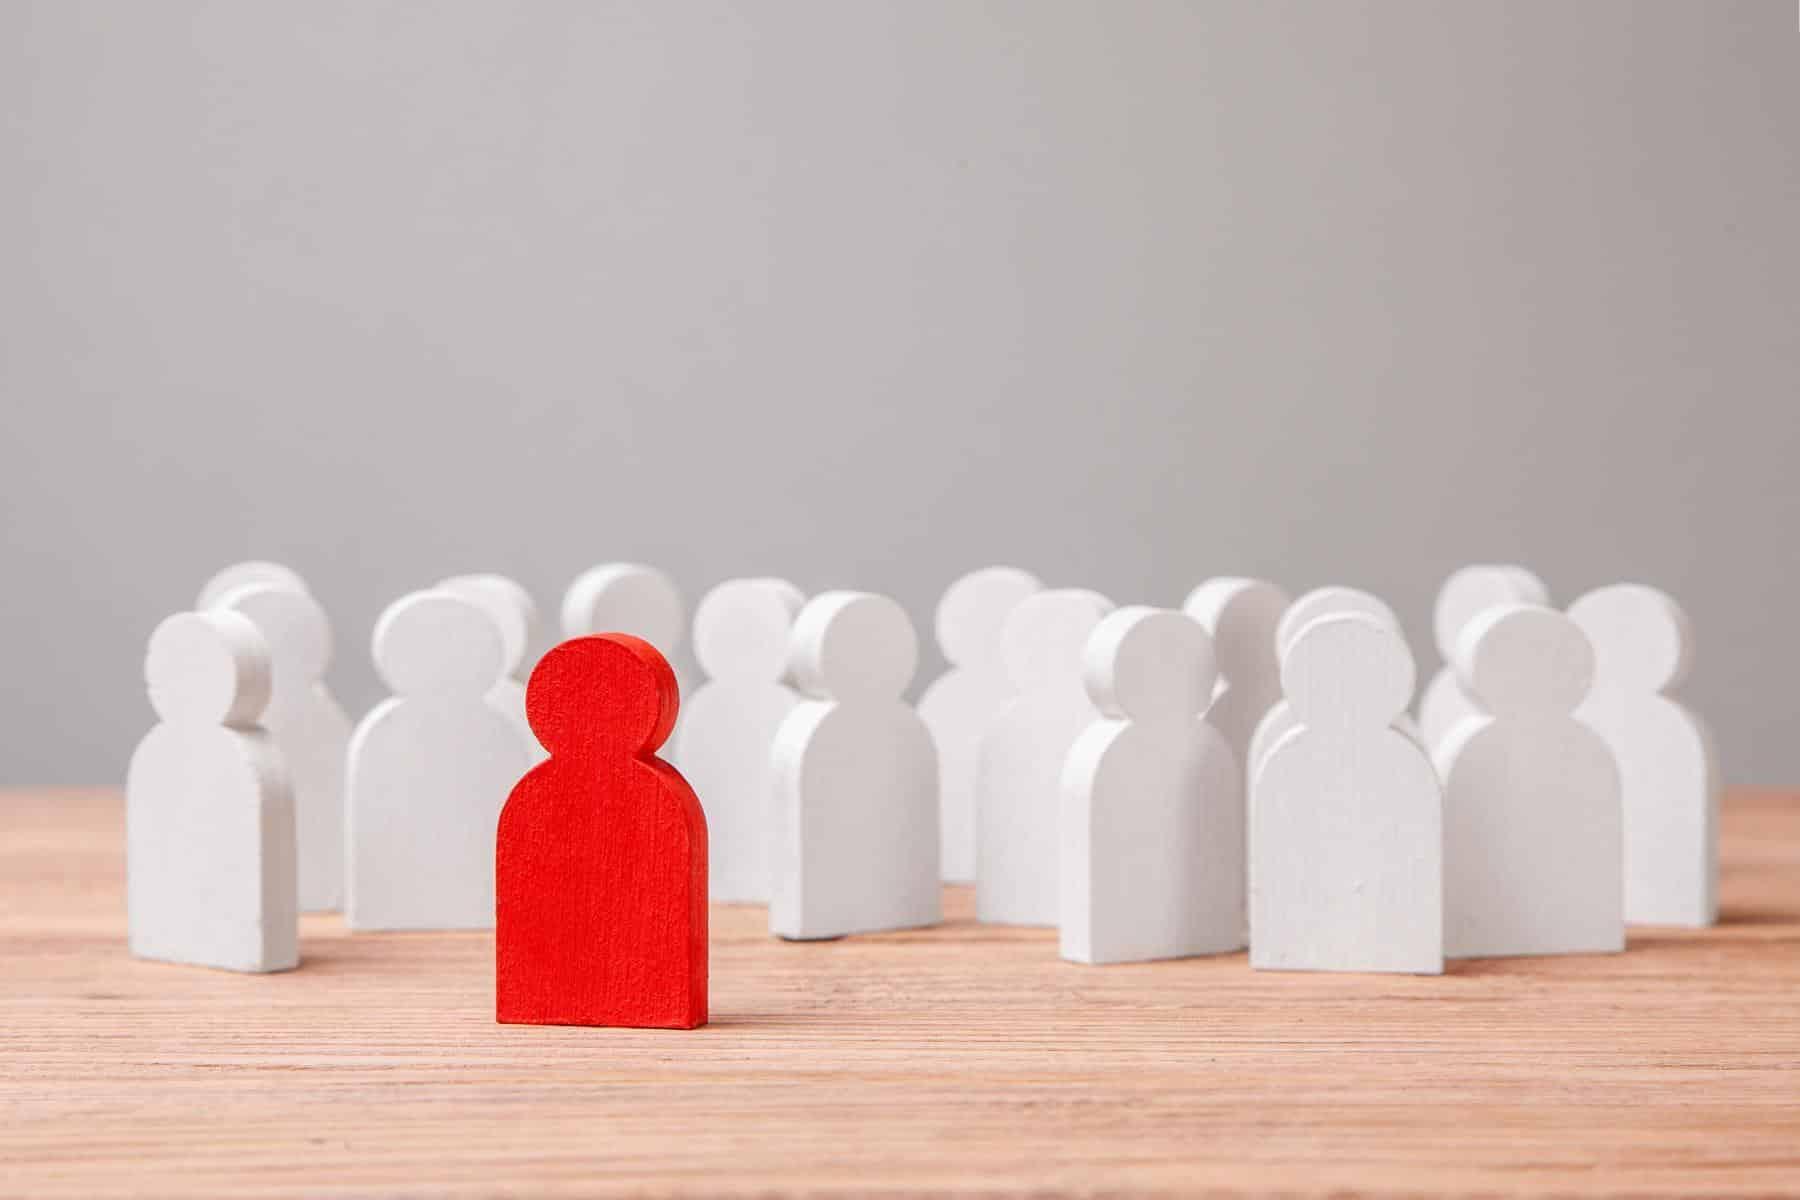 christian-ramm-arbeitsmarktmanager-unterstuetzung-beratung-foerdermittel